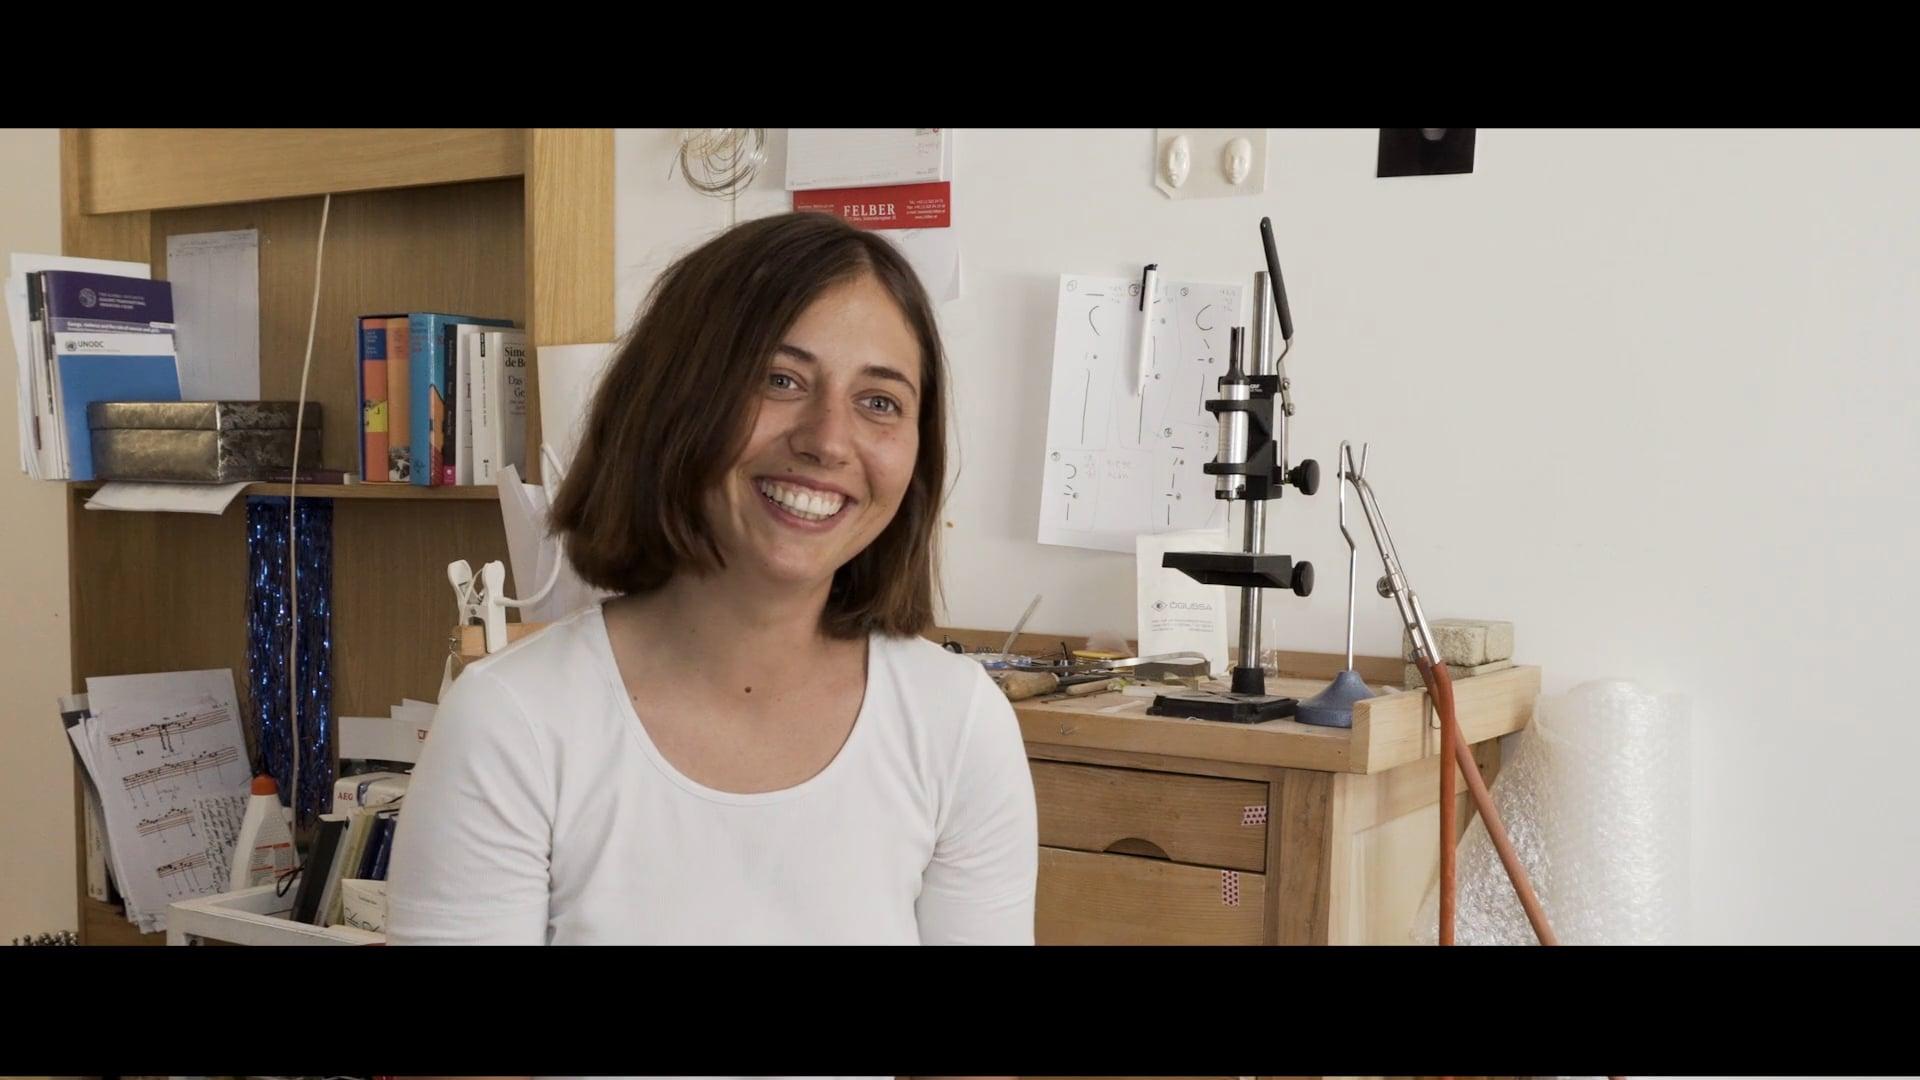 Auris, Short Documentary Portrait